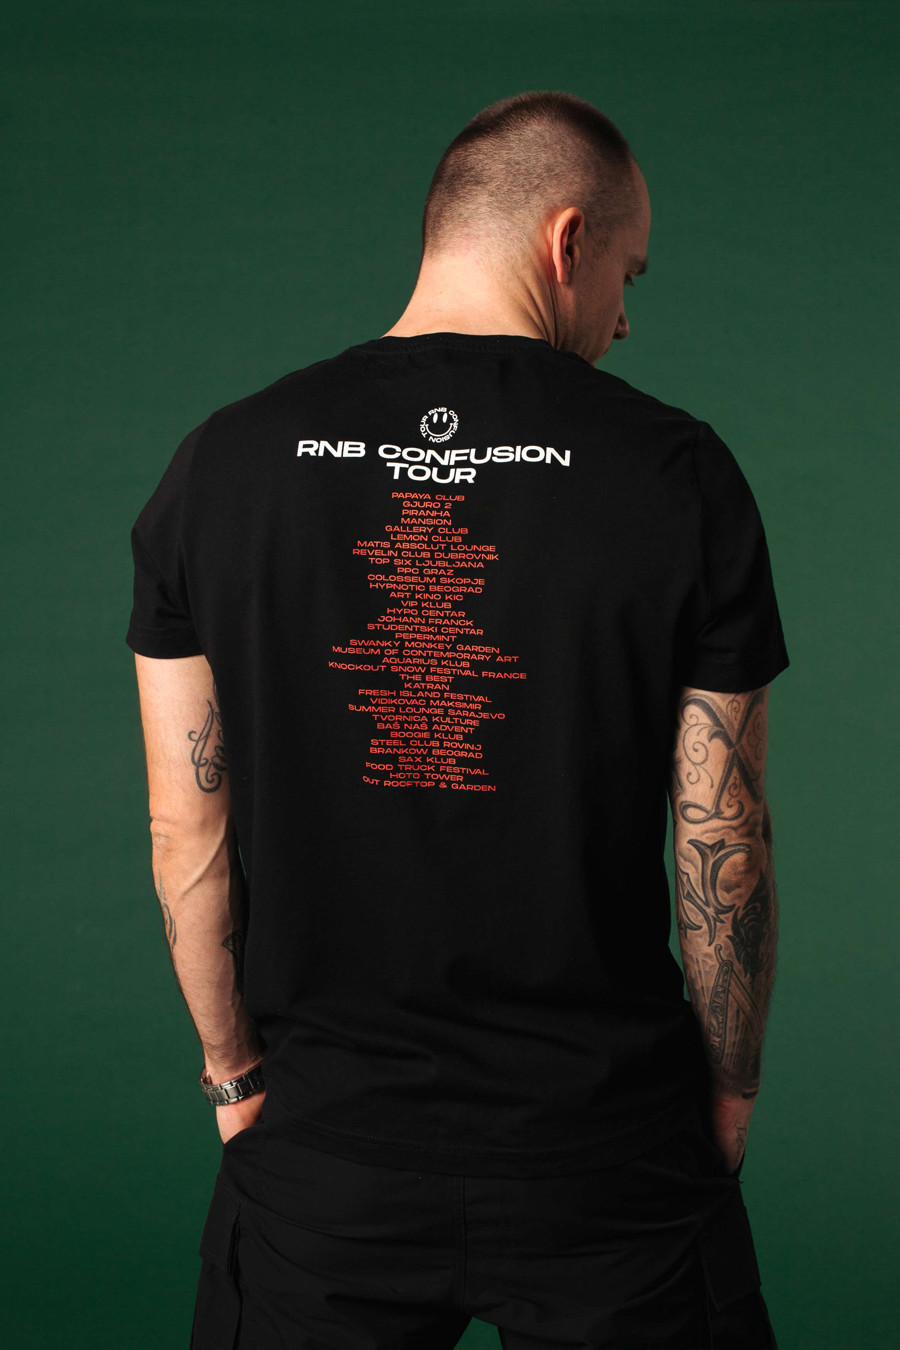 RNB Confusion merch